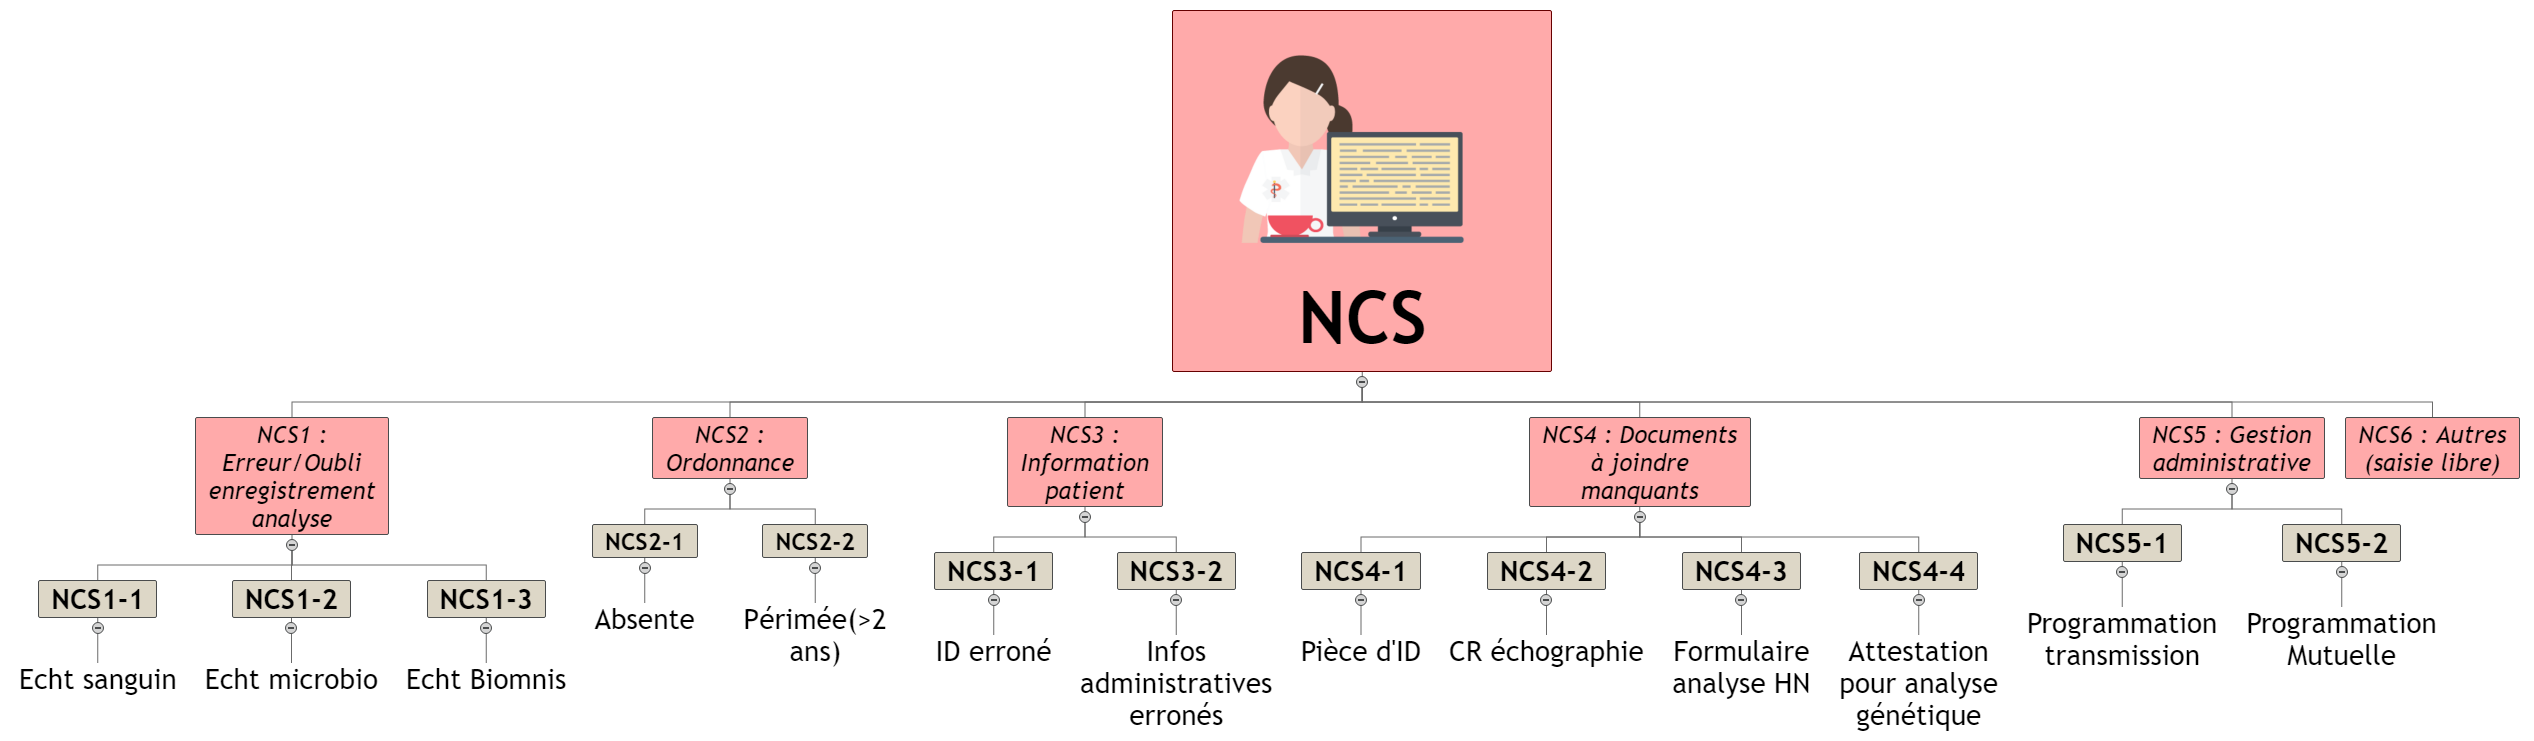 NCS1 Mind Maps